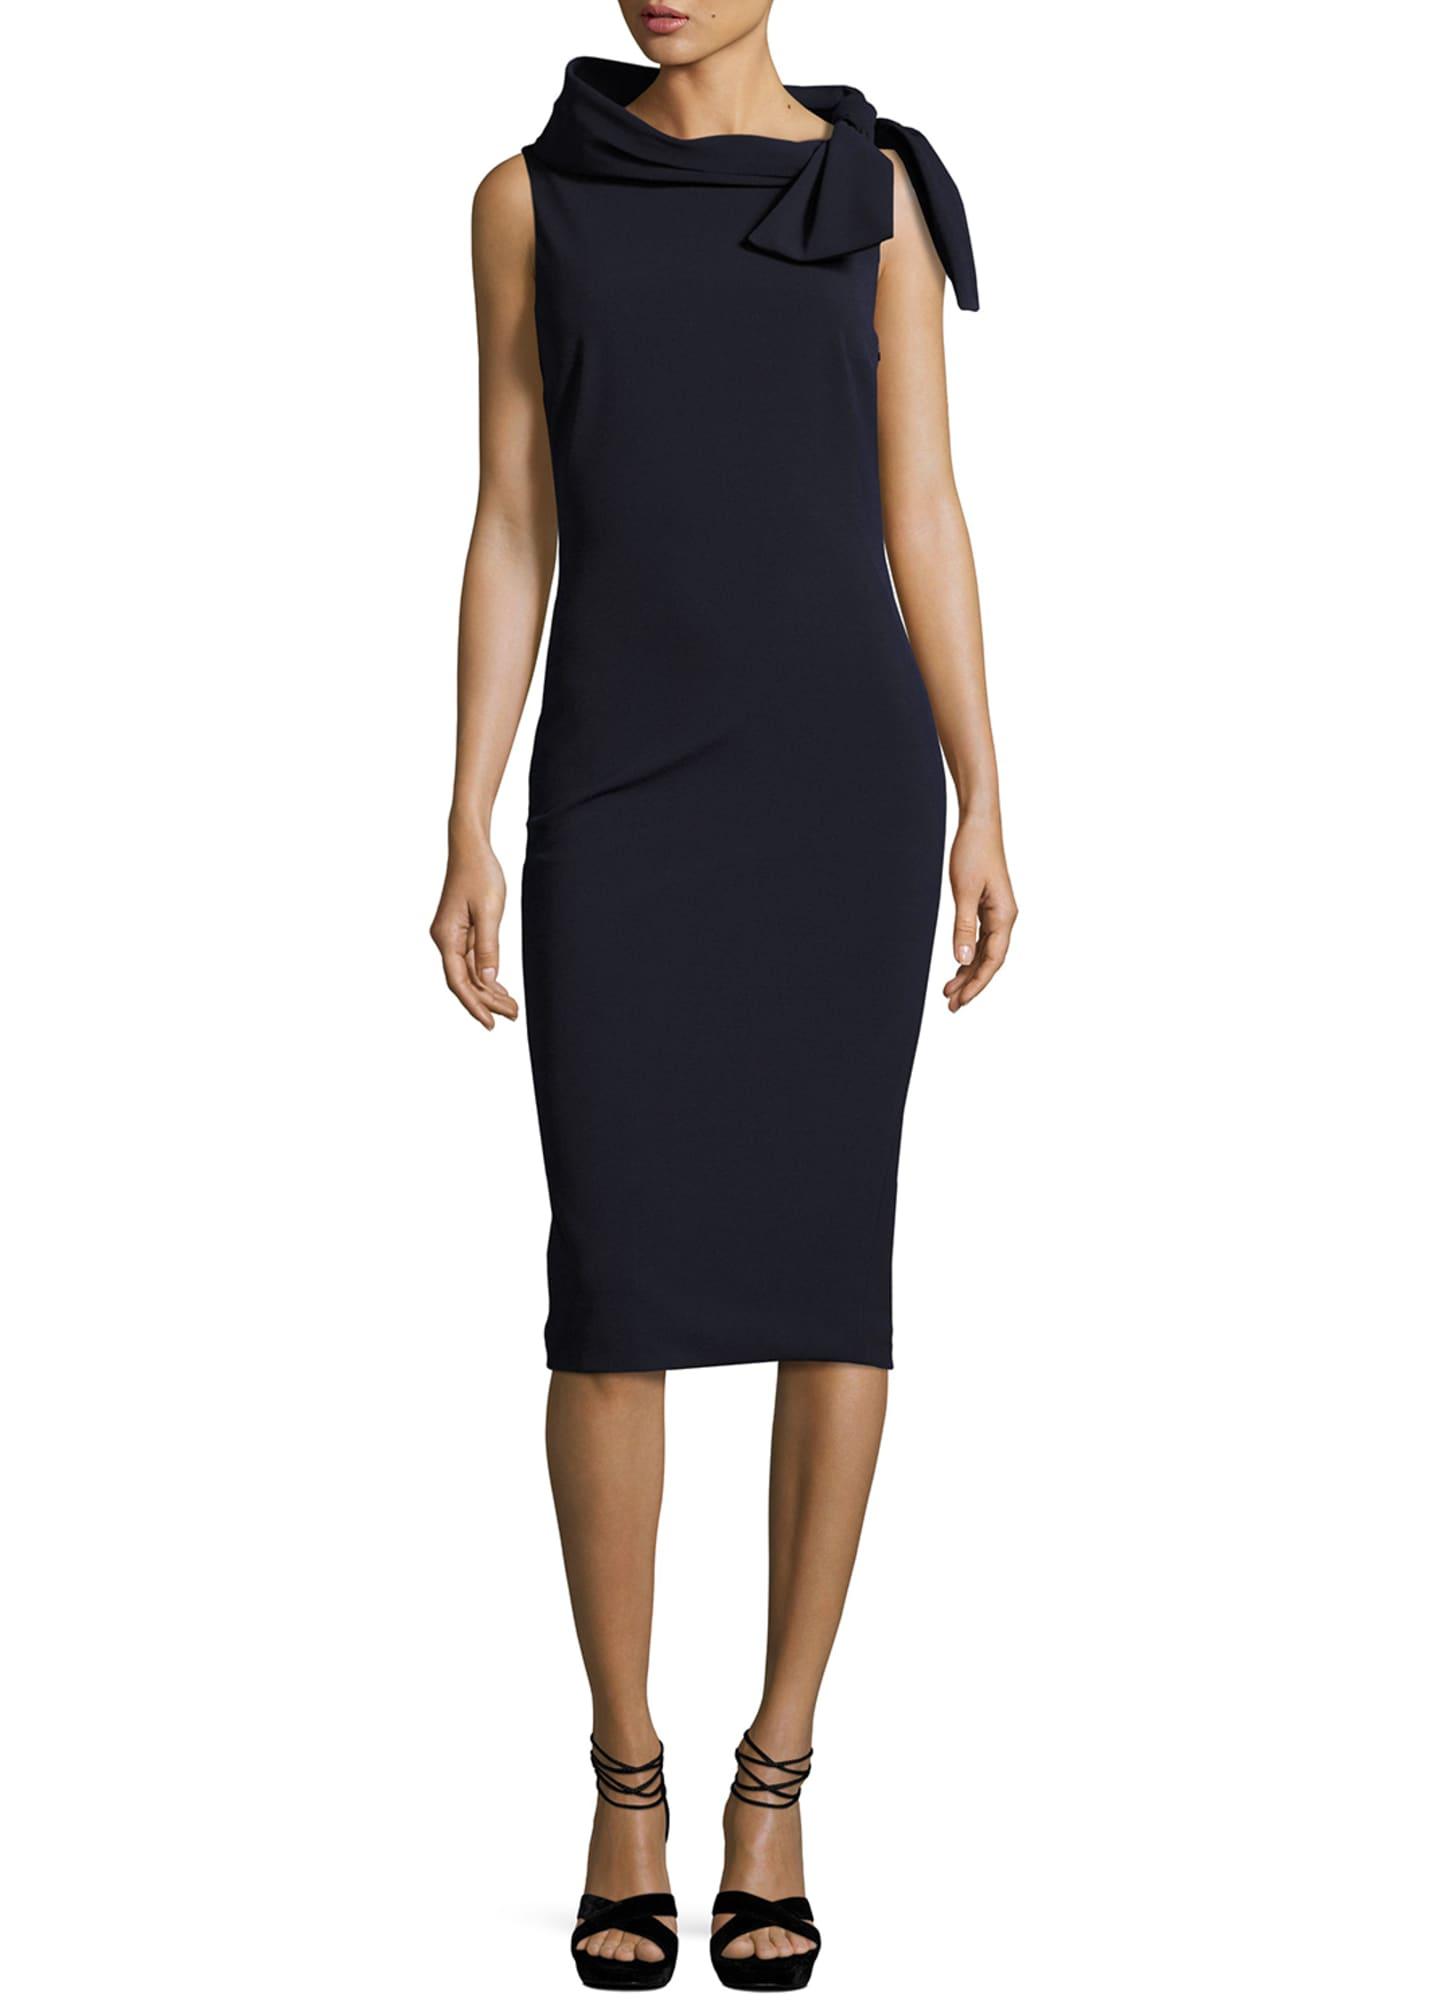 Badgley Mischka Collection Sleeveless Tie-Neck Cocktail Dress